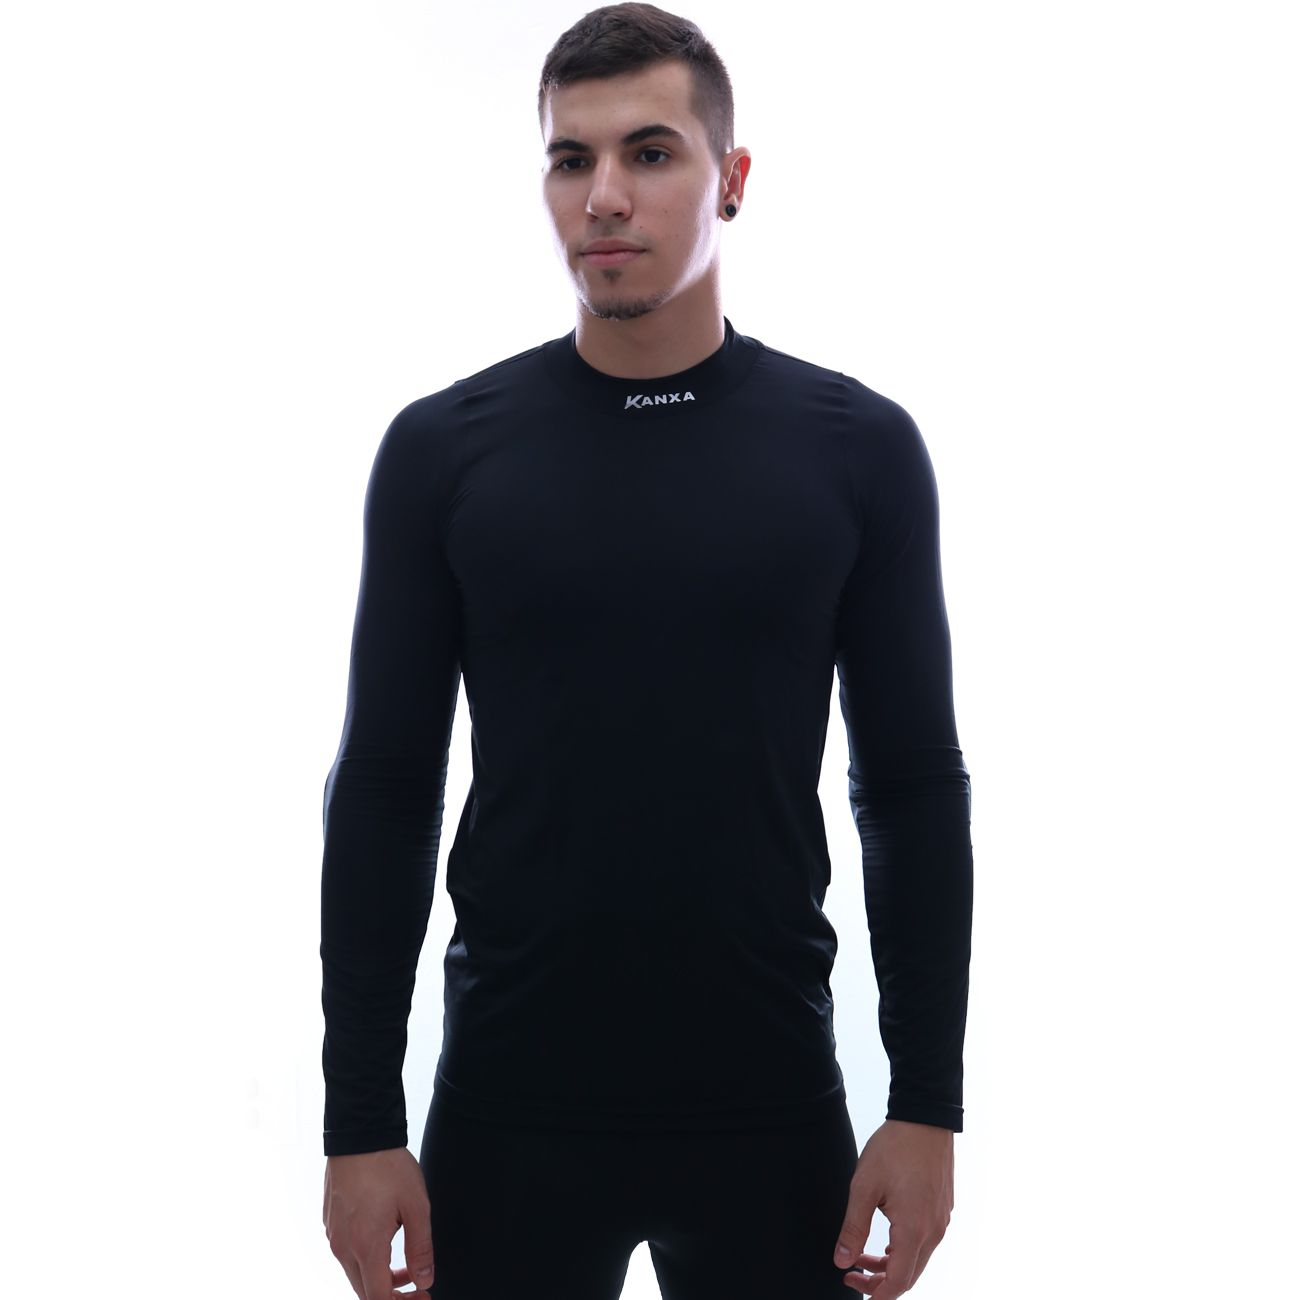 Camisa Kanxa Strech Goleiro Preto